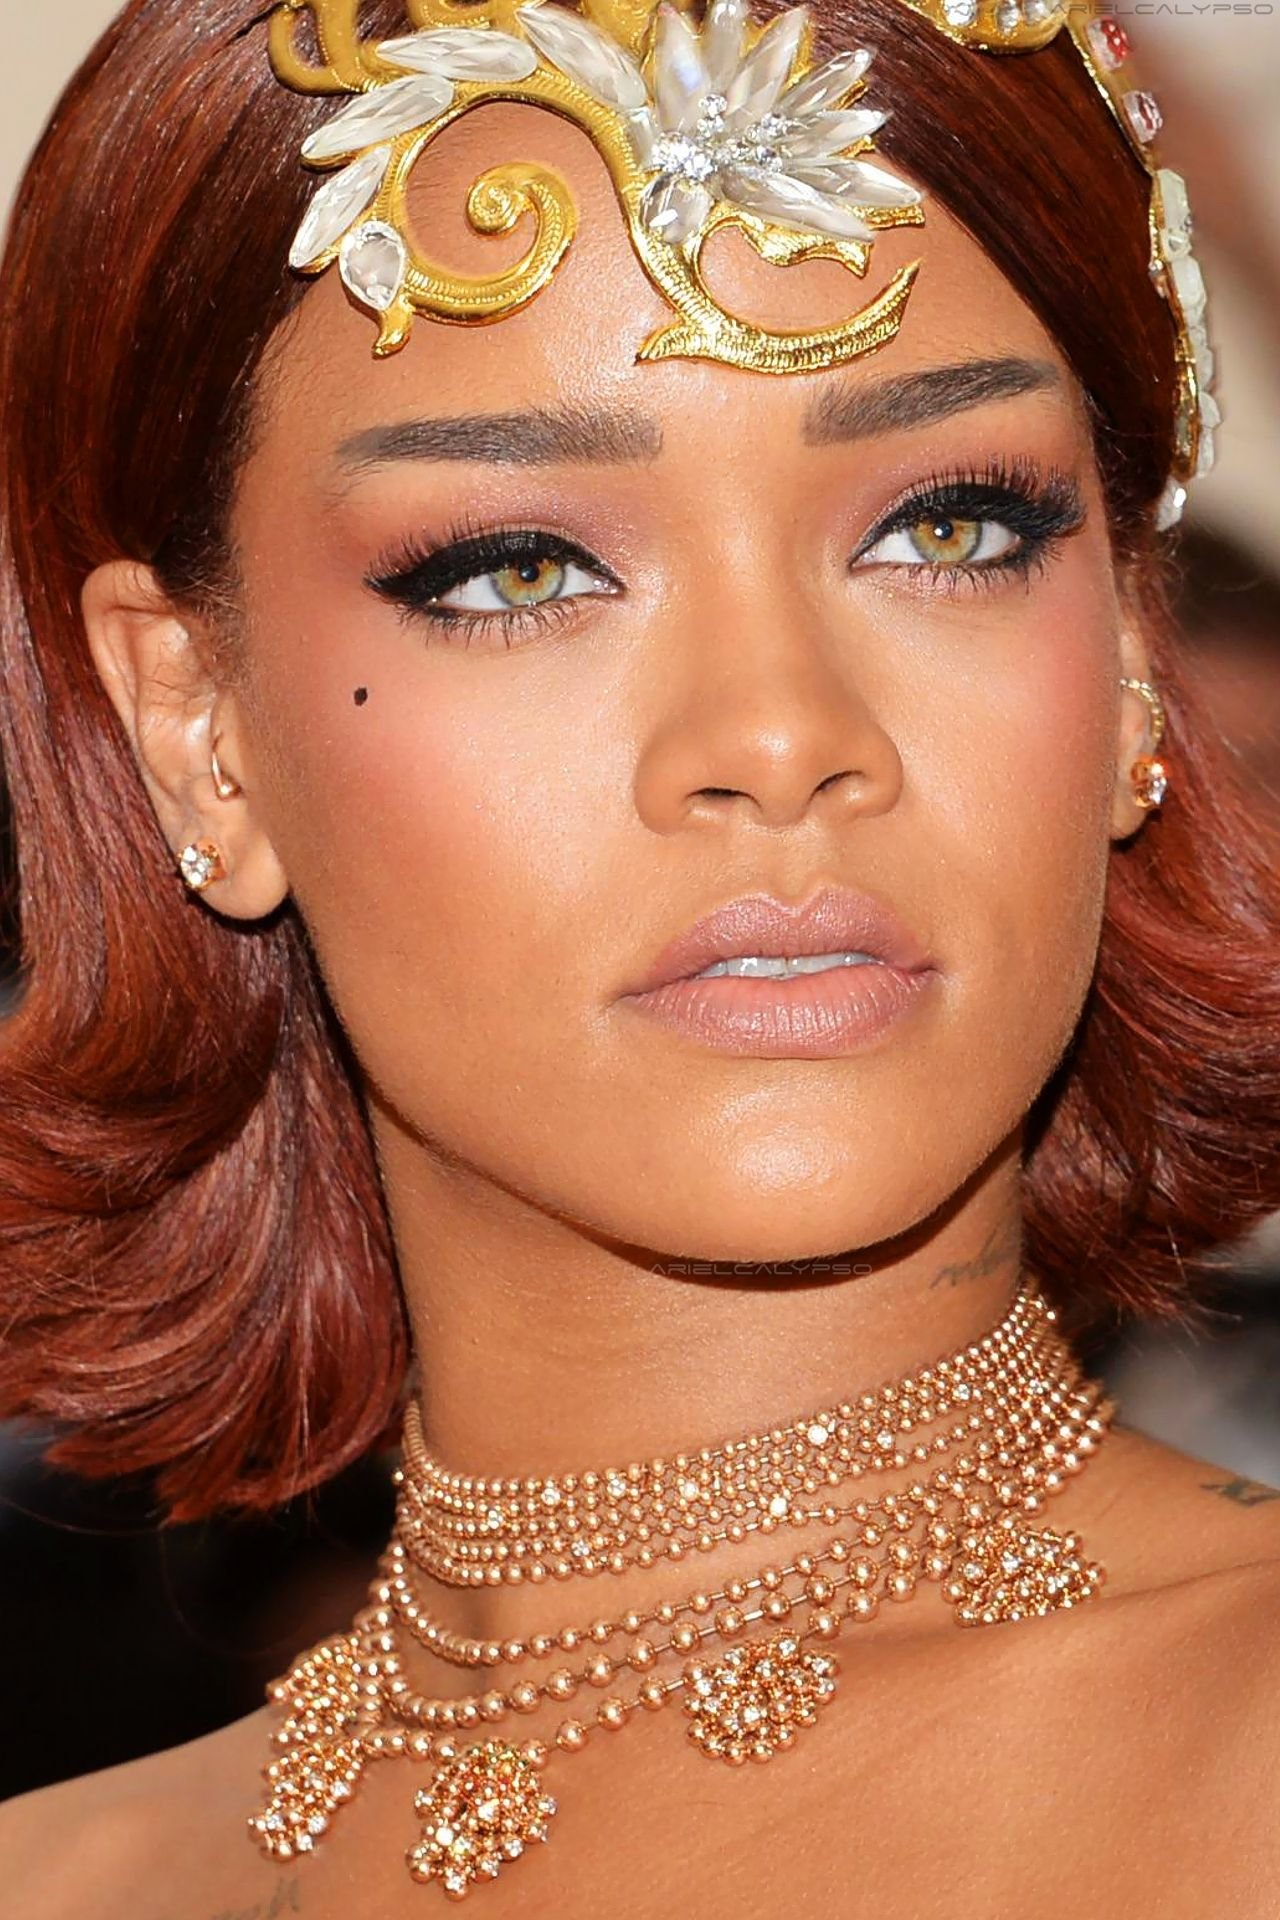 Robyn Rihanna Fenty R O O T S Rihanna Costume Rihanna